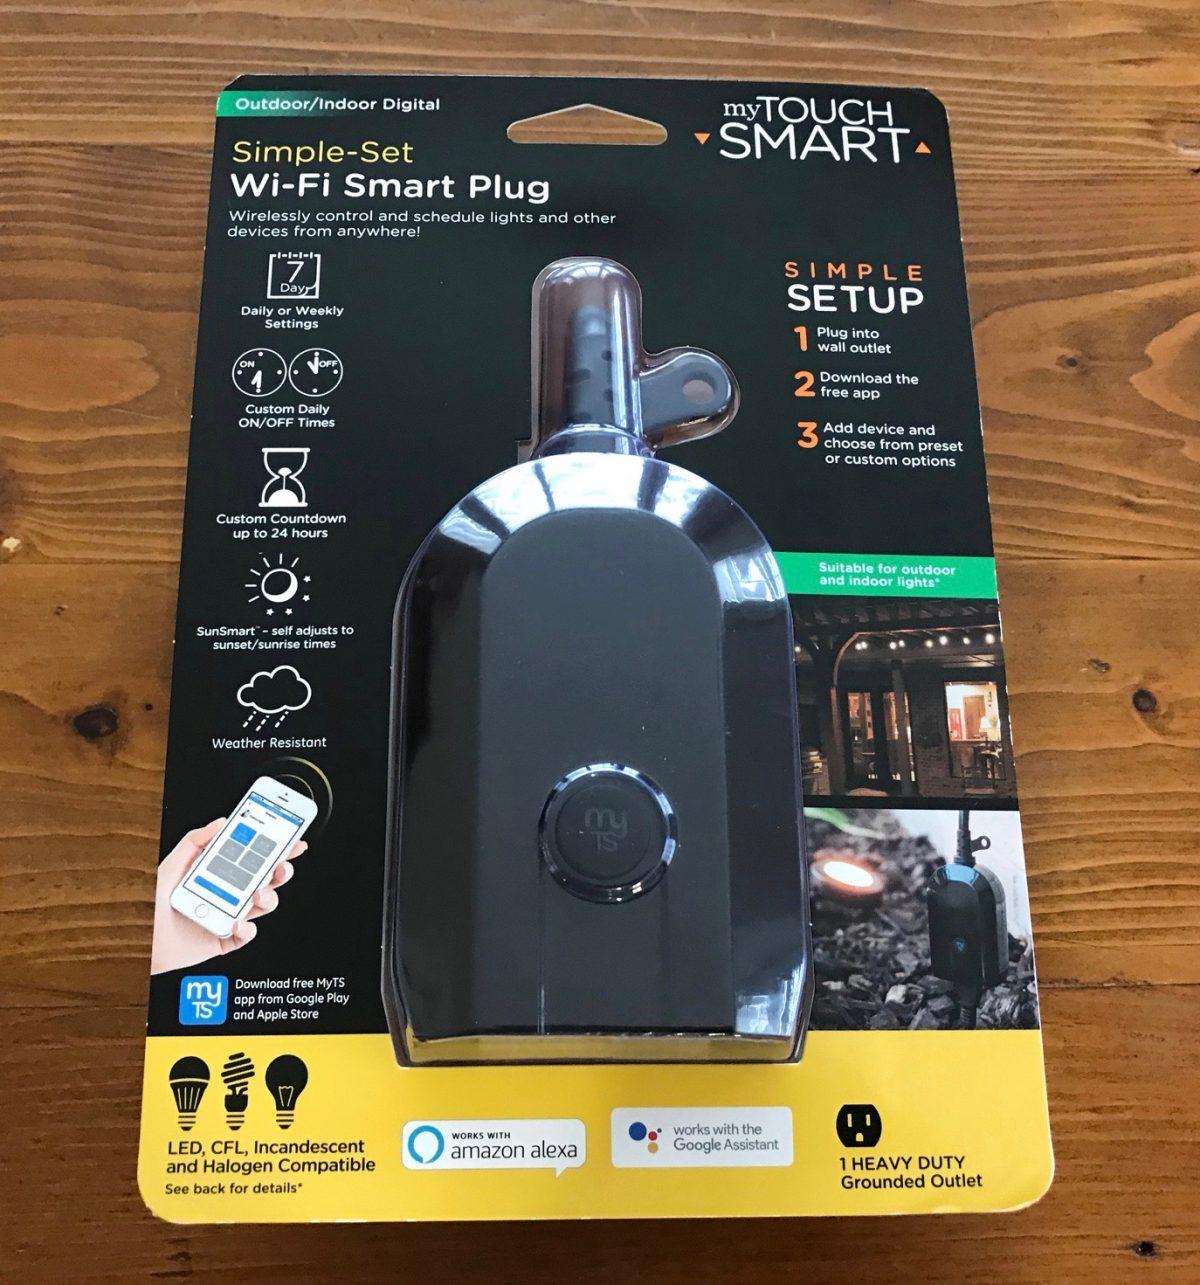 myTouchSmart Outdoor Wi-Fi Smart Plug